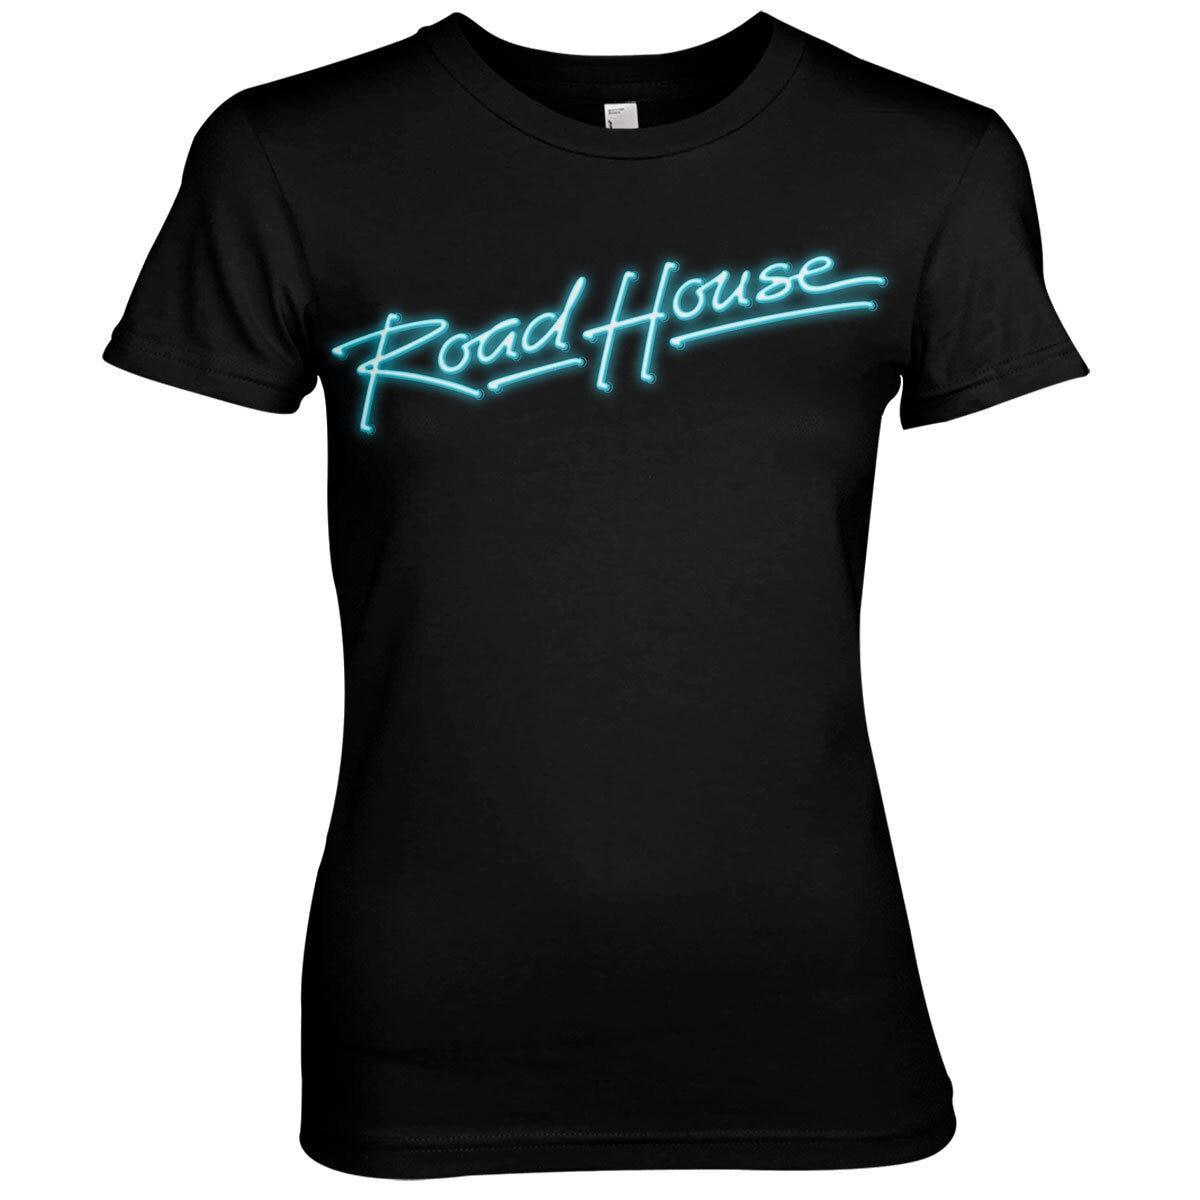 Road House Logo Girly Tee